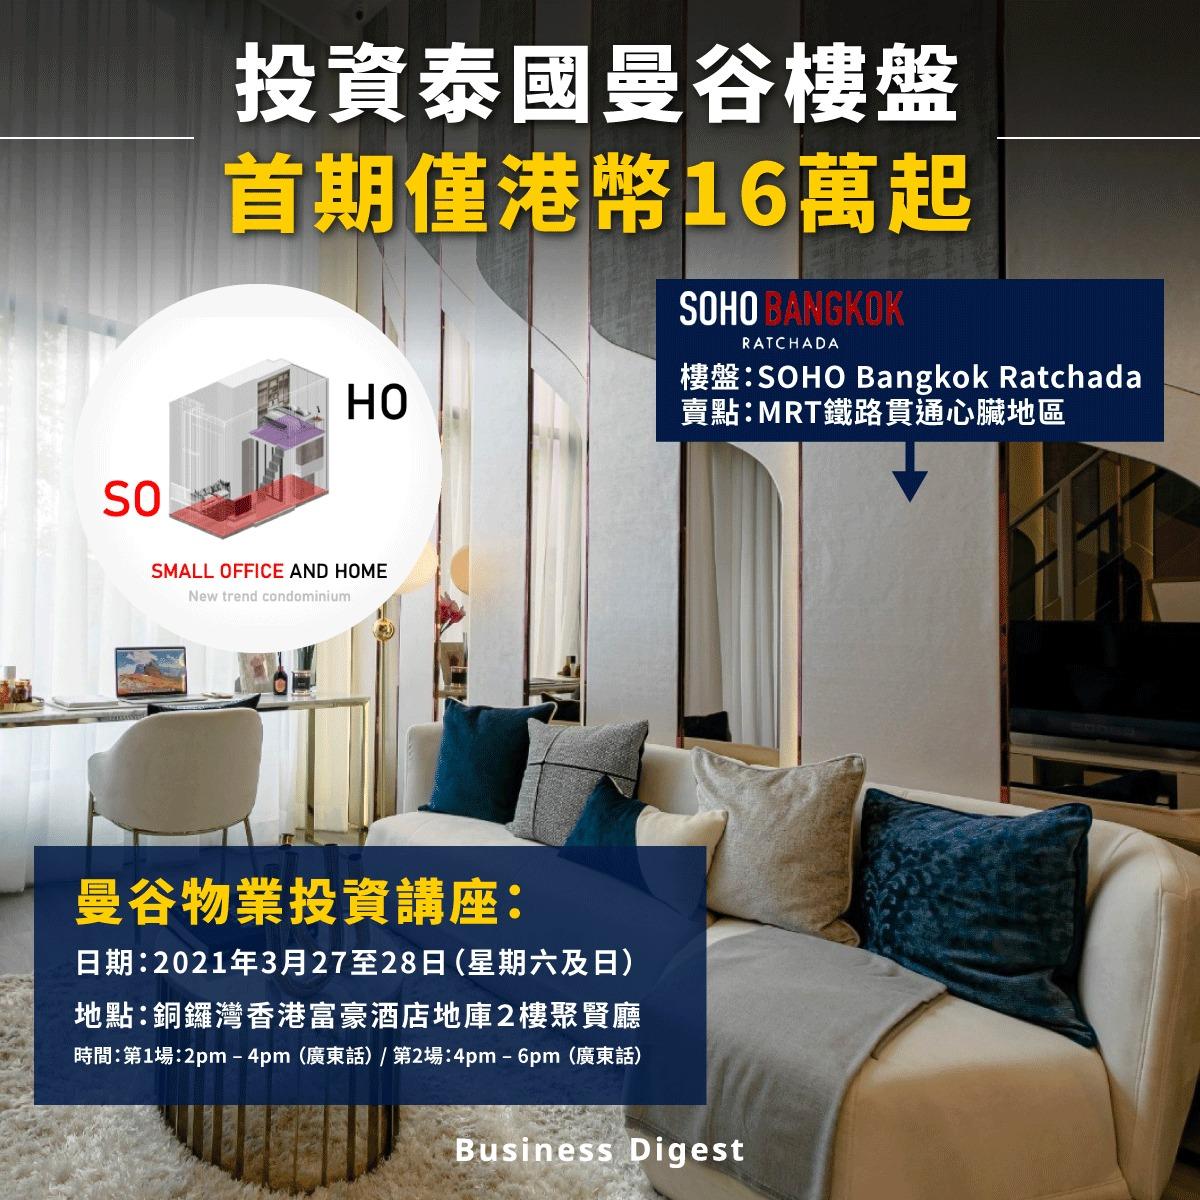 【BD海外樓】投資泰國曼谷樓盤,首期僅港幣16萬起